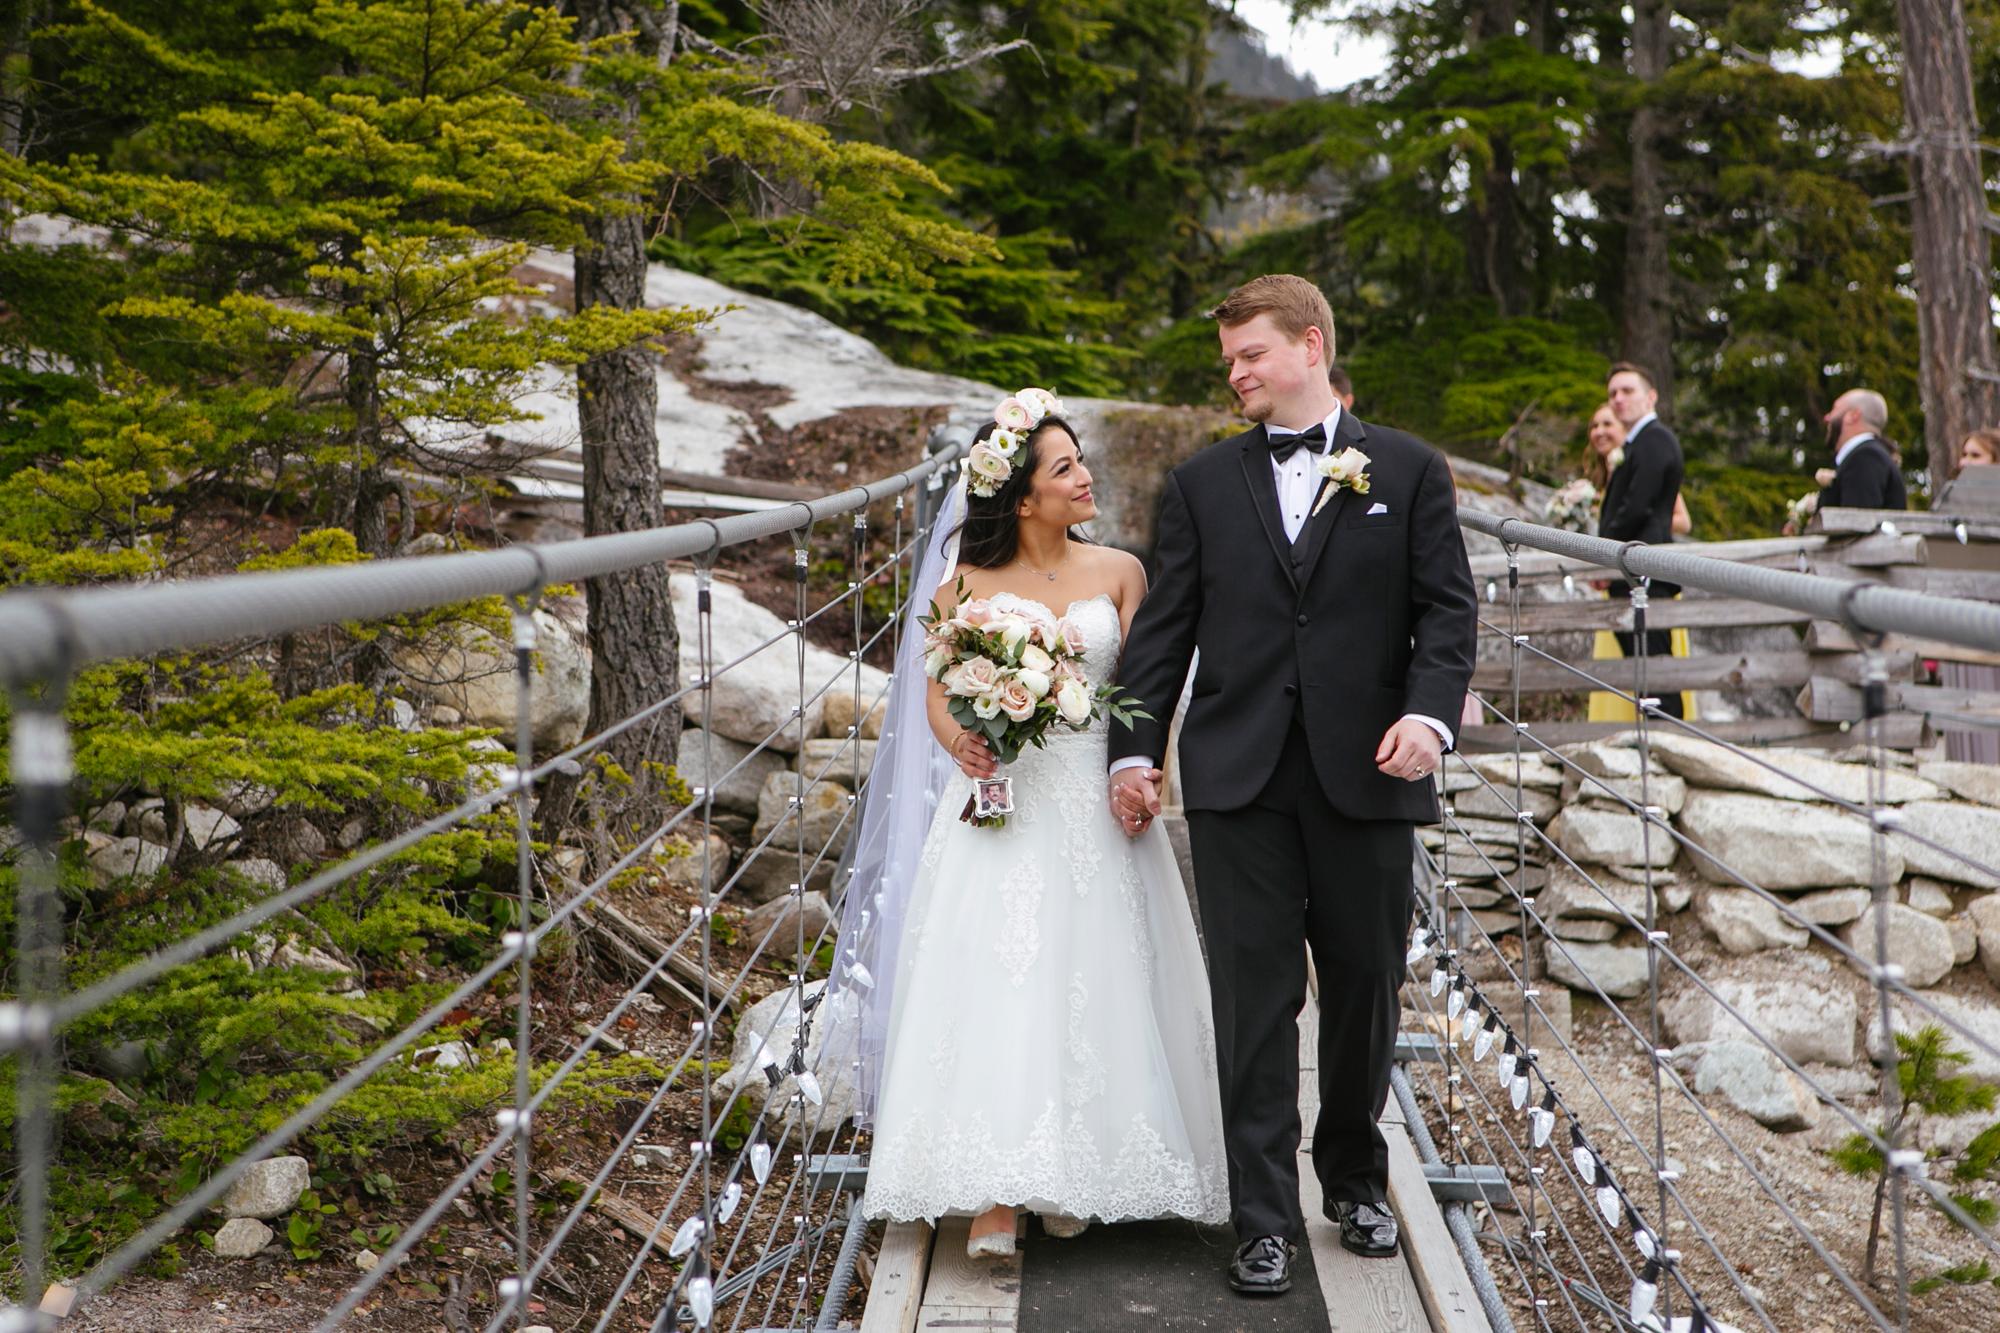 vancouver-luxury-wedding-photographer-lori-miles-0622.jpg